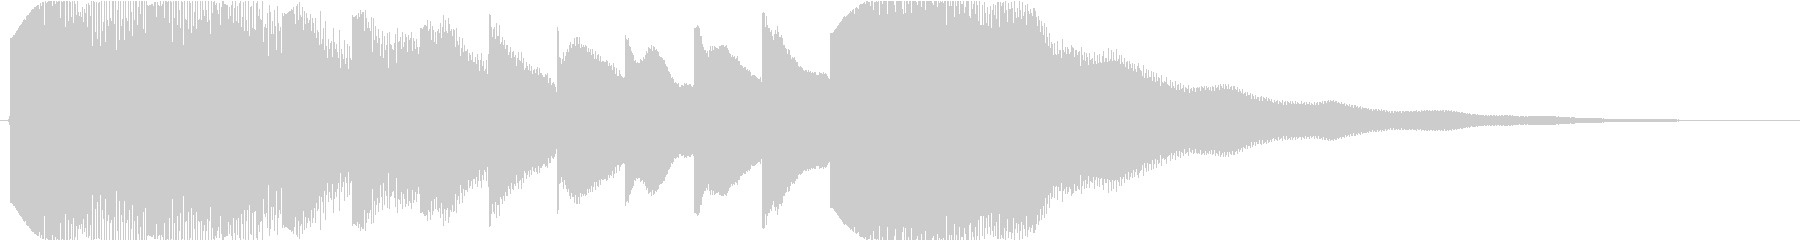 Sound logo, music box makes me feel sad's unreproduced waveform